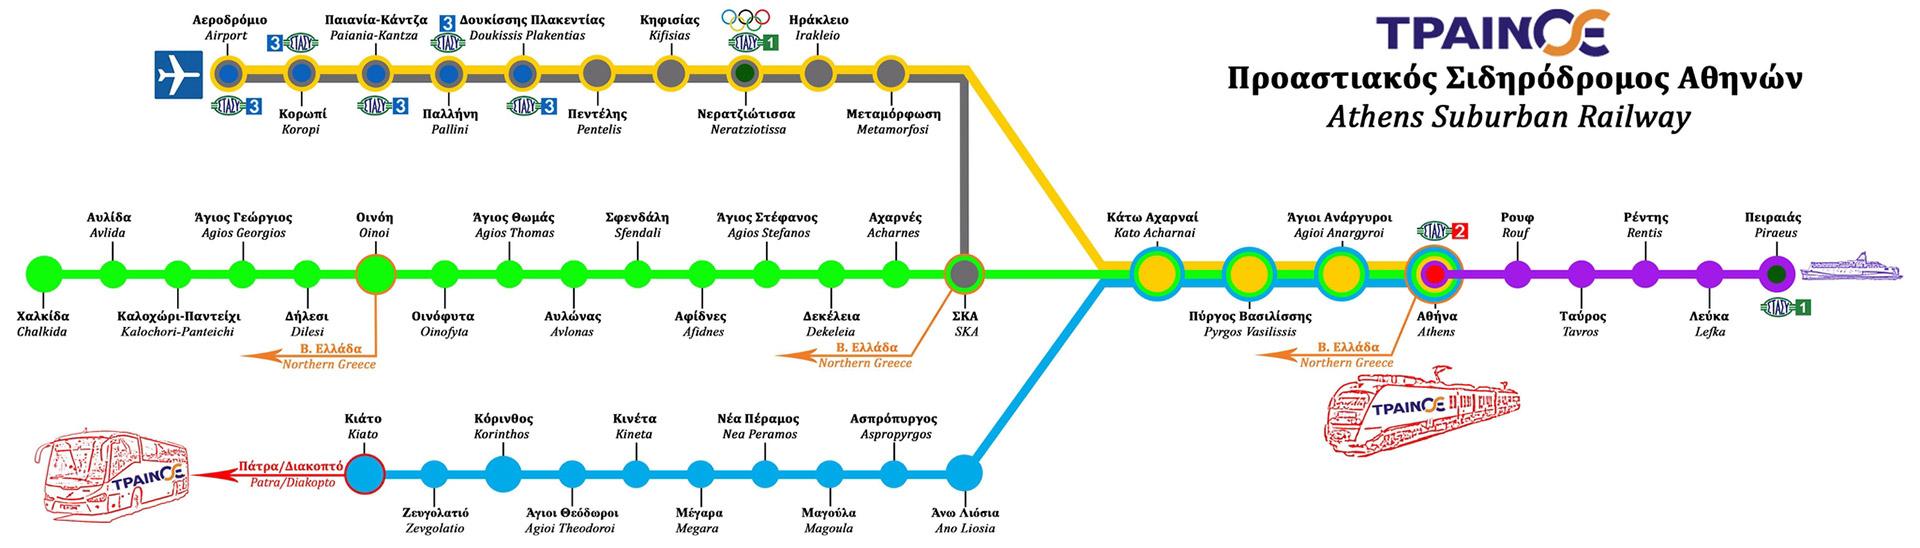 Athens Suburban Railway Map